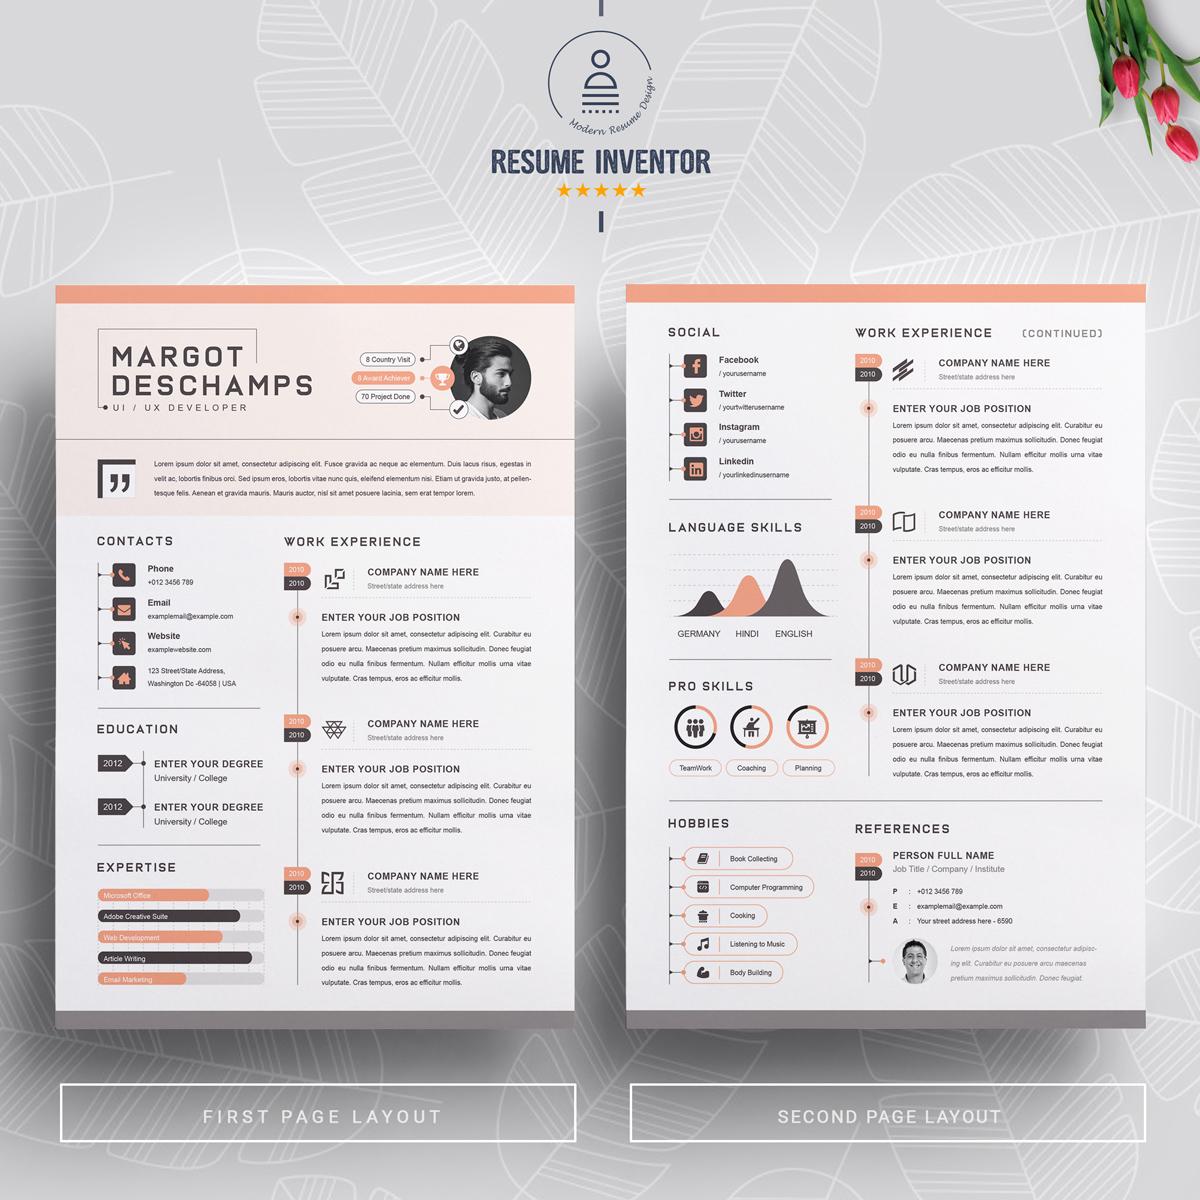 https://s3u.tmimgcdn.com/1860567-1580631056670_02_2-Pages-Free-Resume-Design-Template.jpg